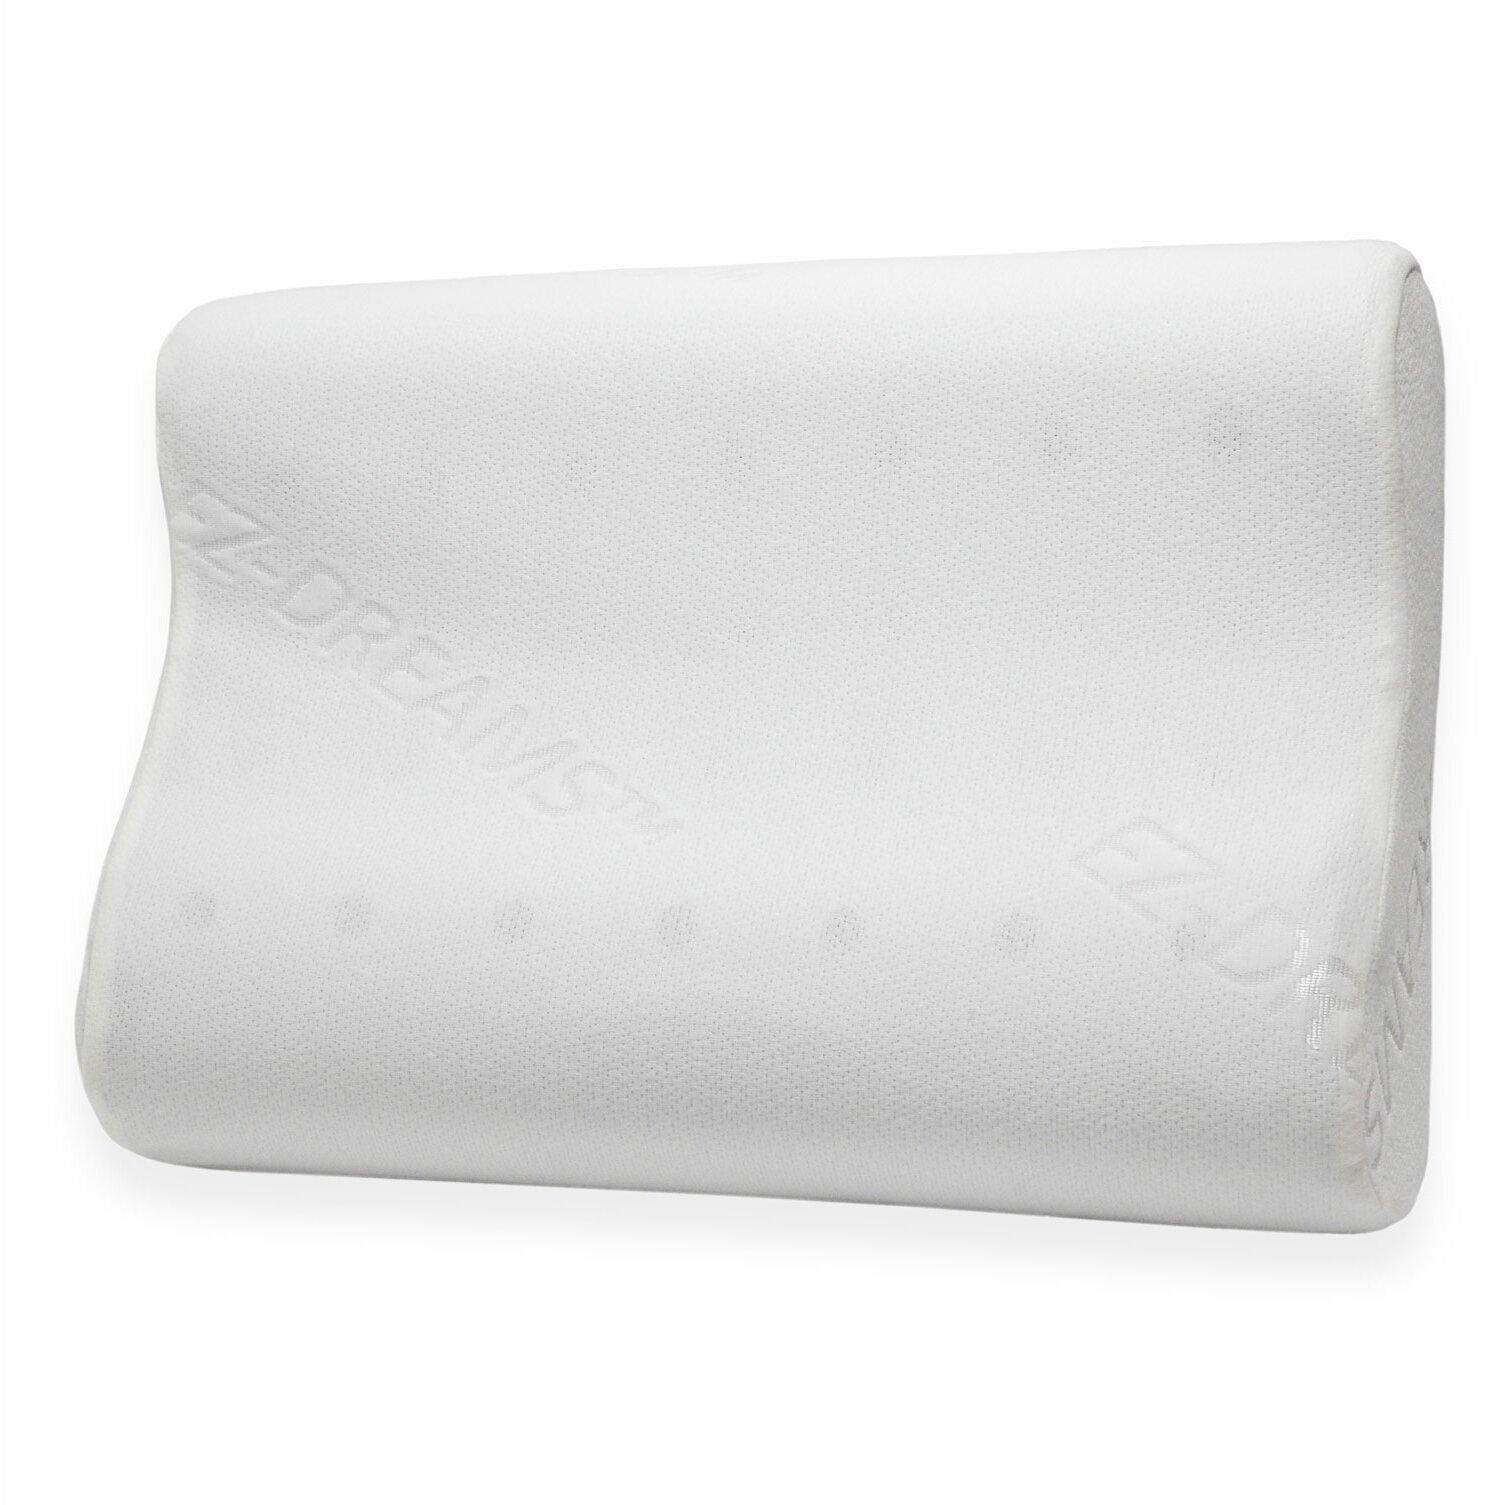 pegasus home fashions ez dreams contour memory foam pillow